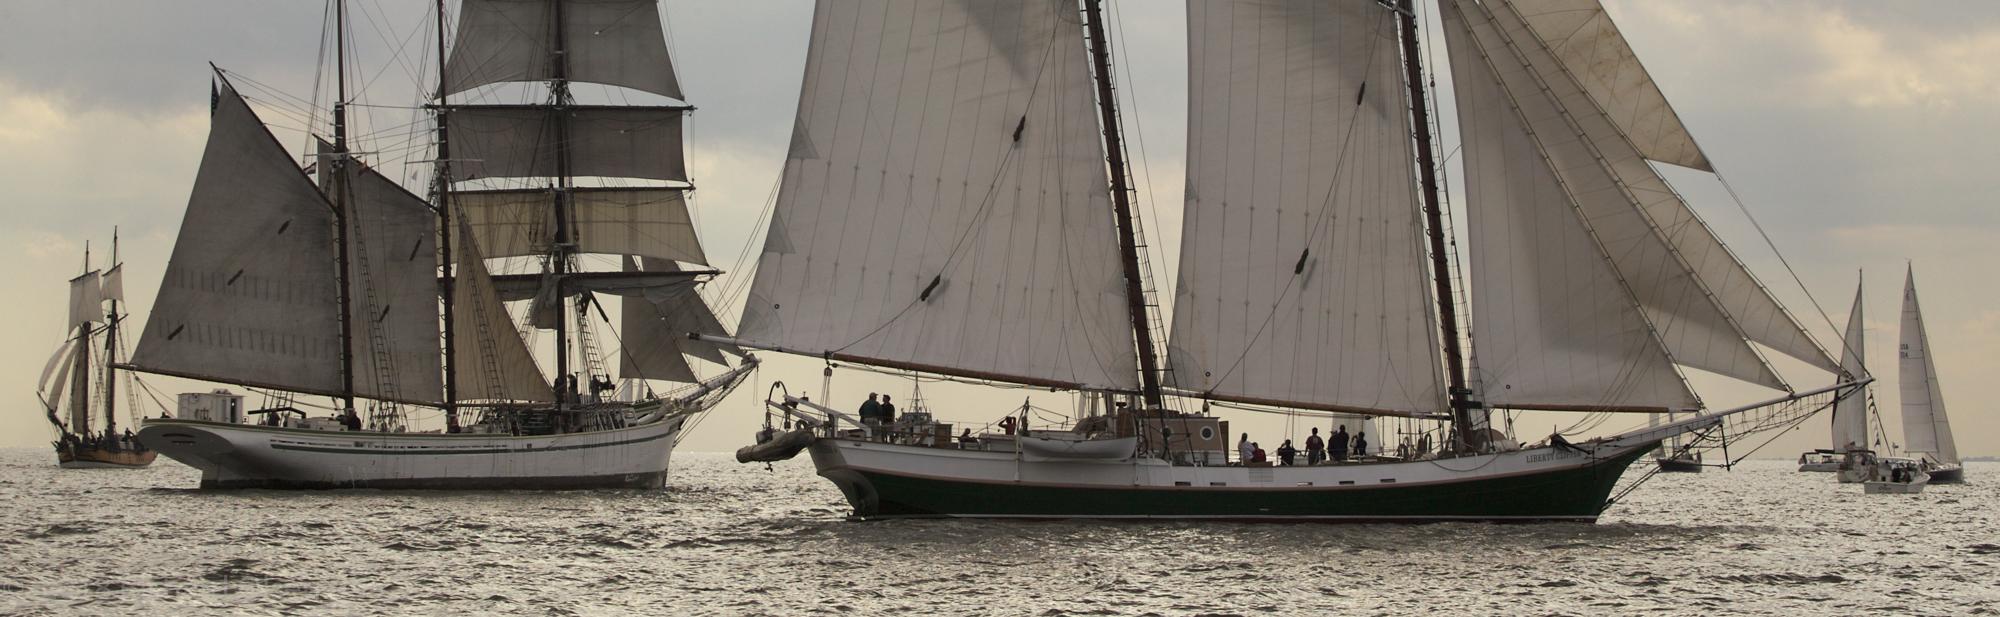 Tall Ships-21